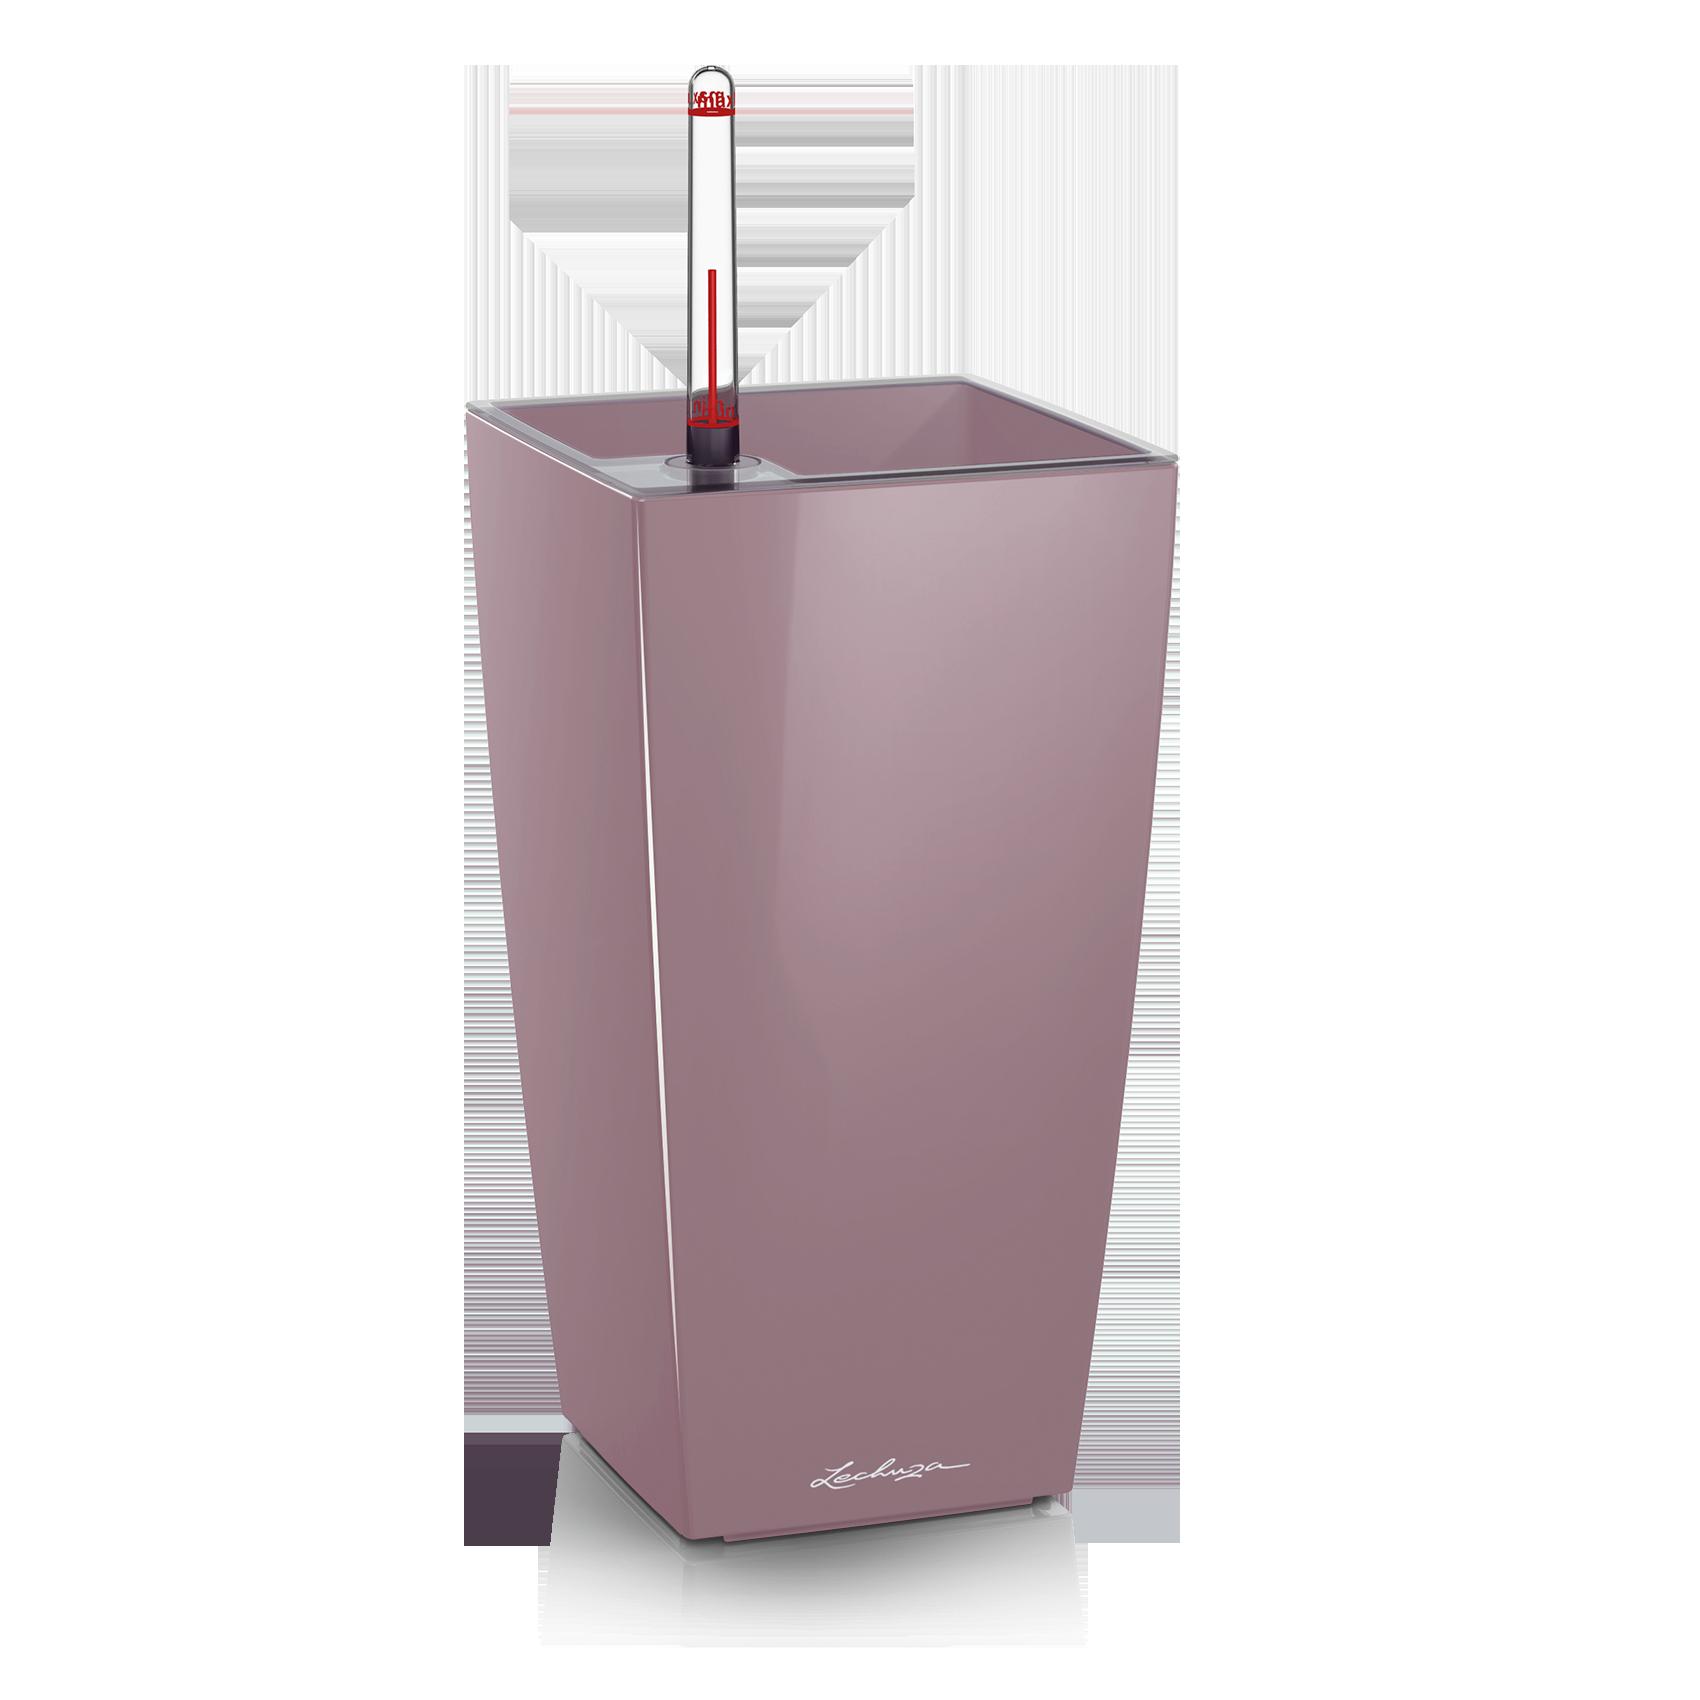 MAXI-CUBI pastellviolett hochglanz